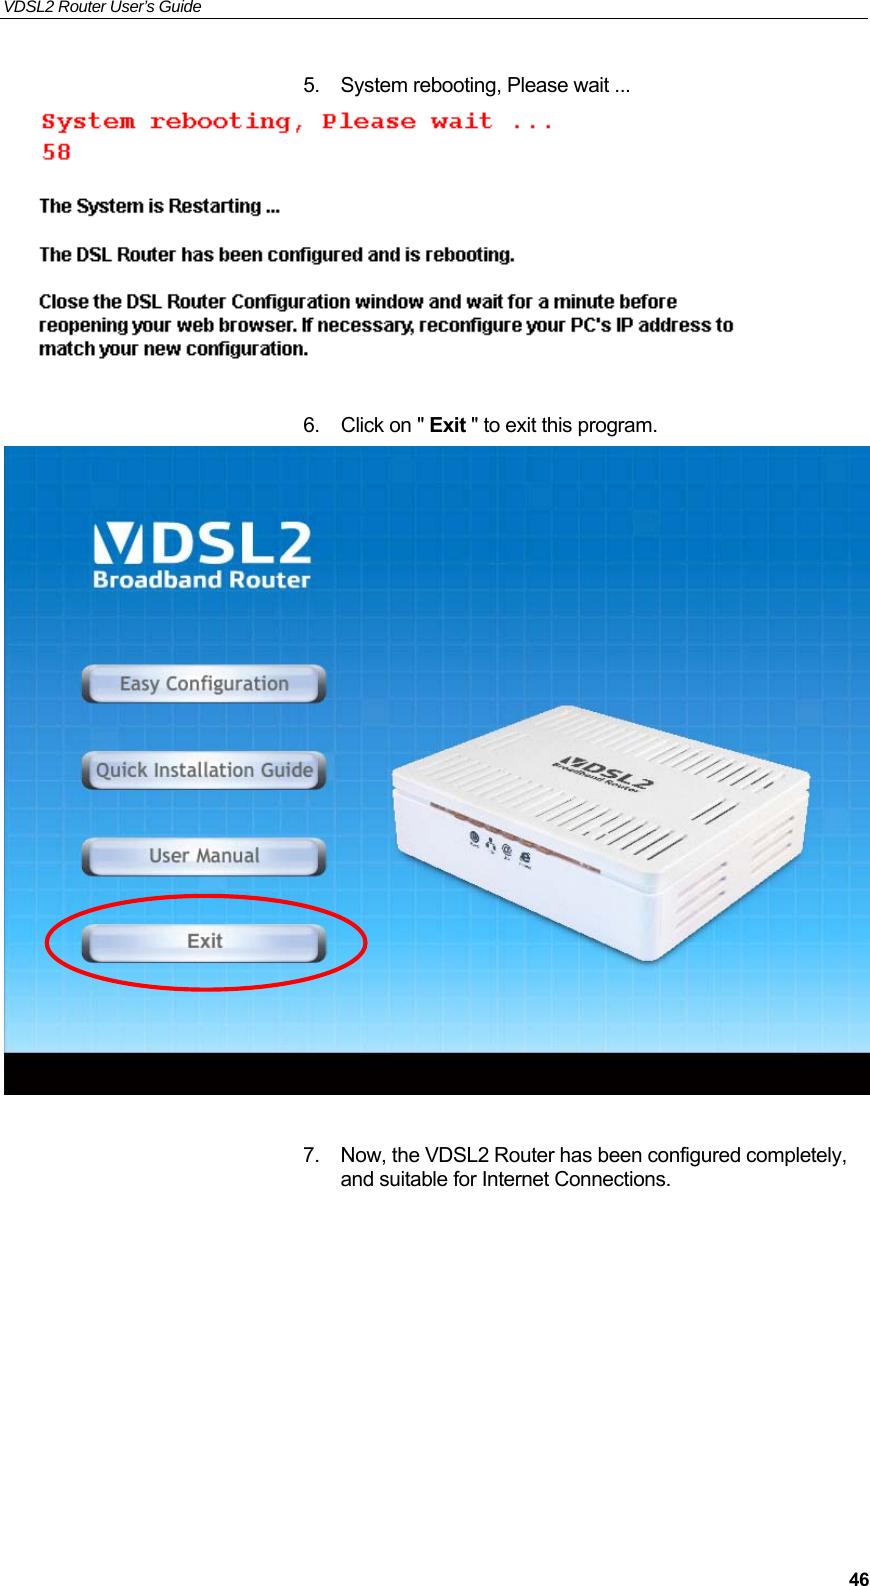 Eltek Technologies V7100 1 Port VDSL2 Router User Manual Manual V7100 Ax